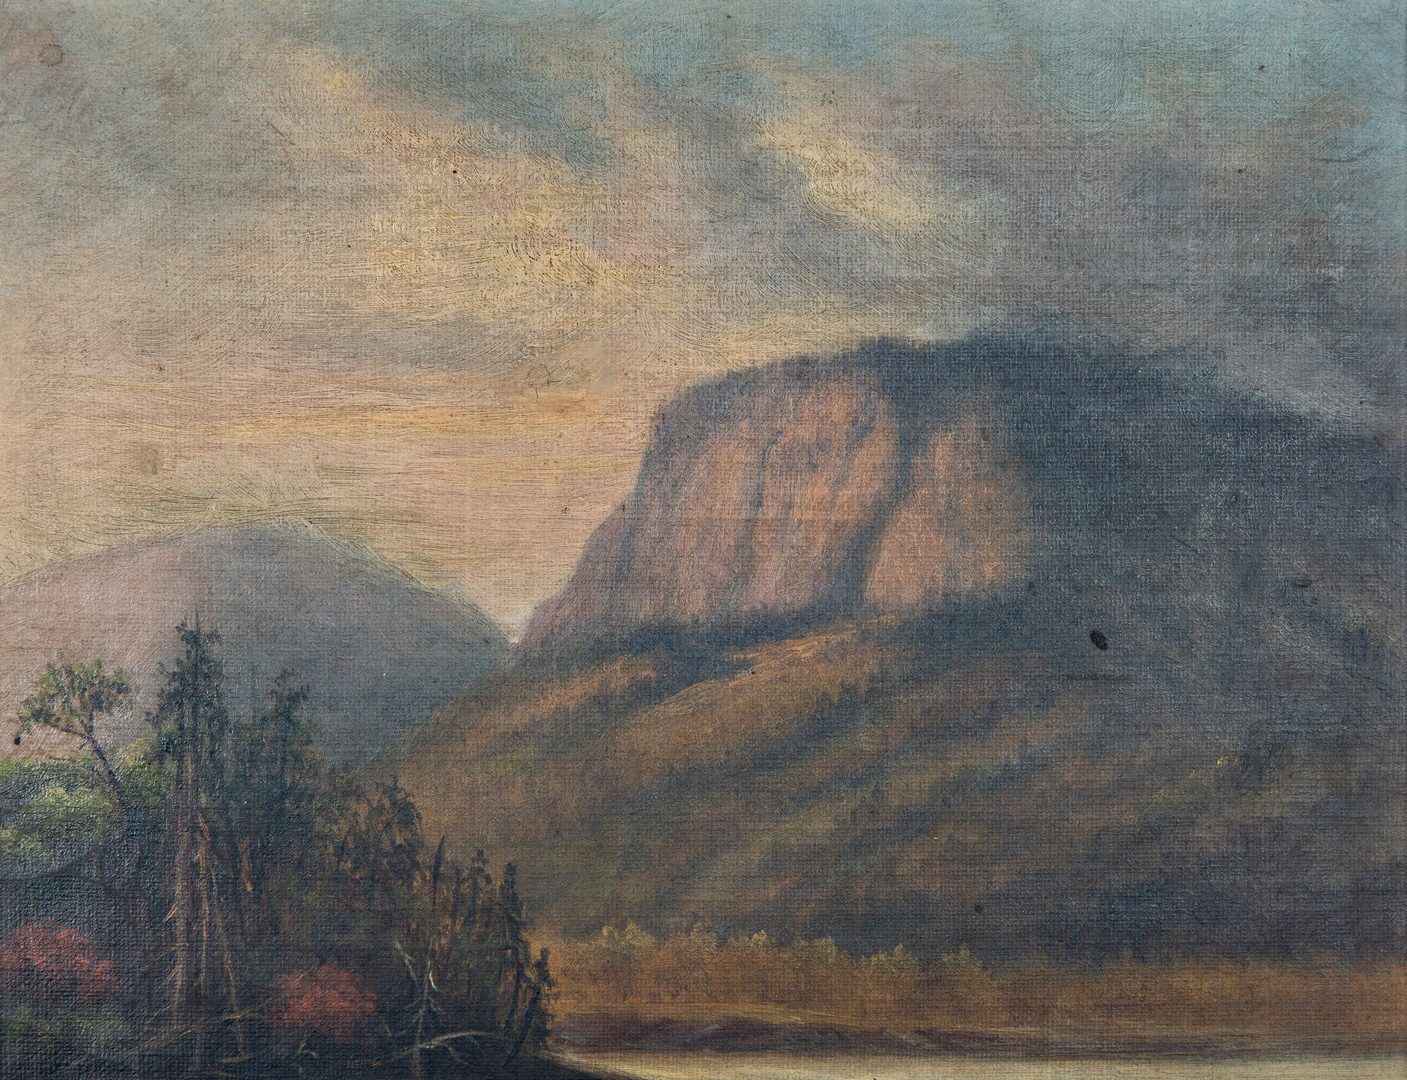 Lot 219: 2 American Artworks, incl. Political Silhouette, O/C Mtn. Landscape